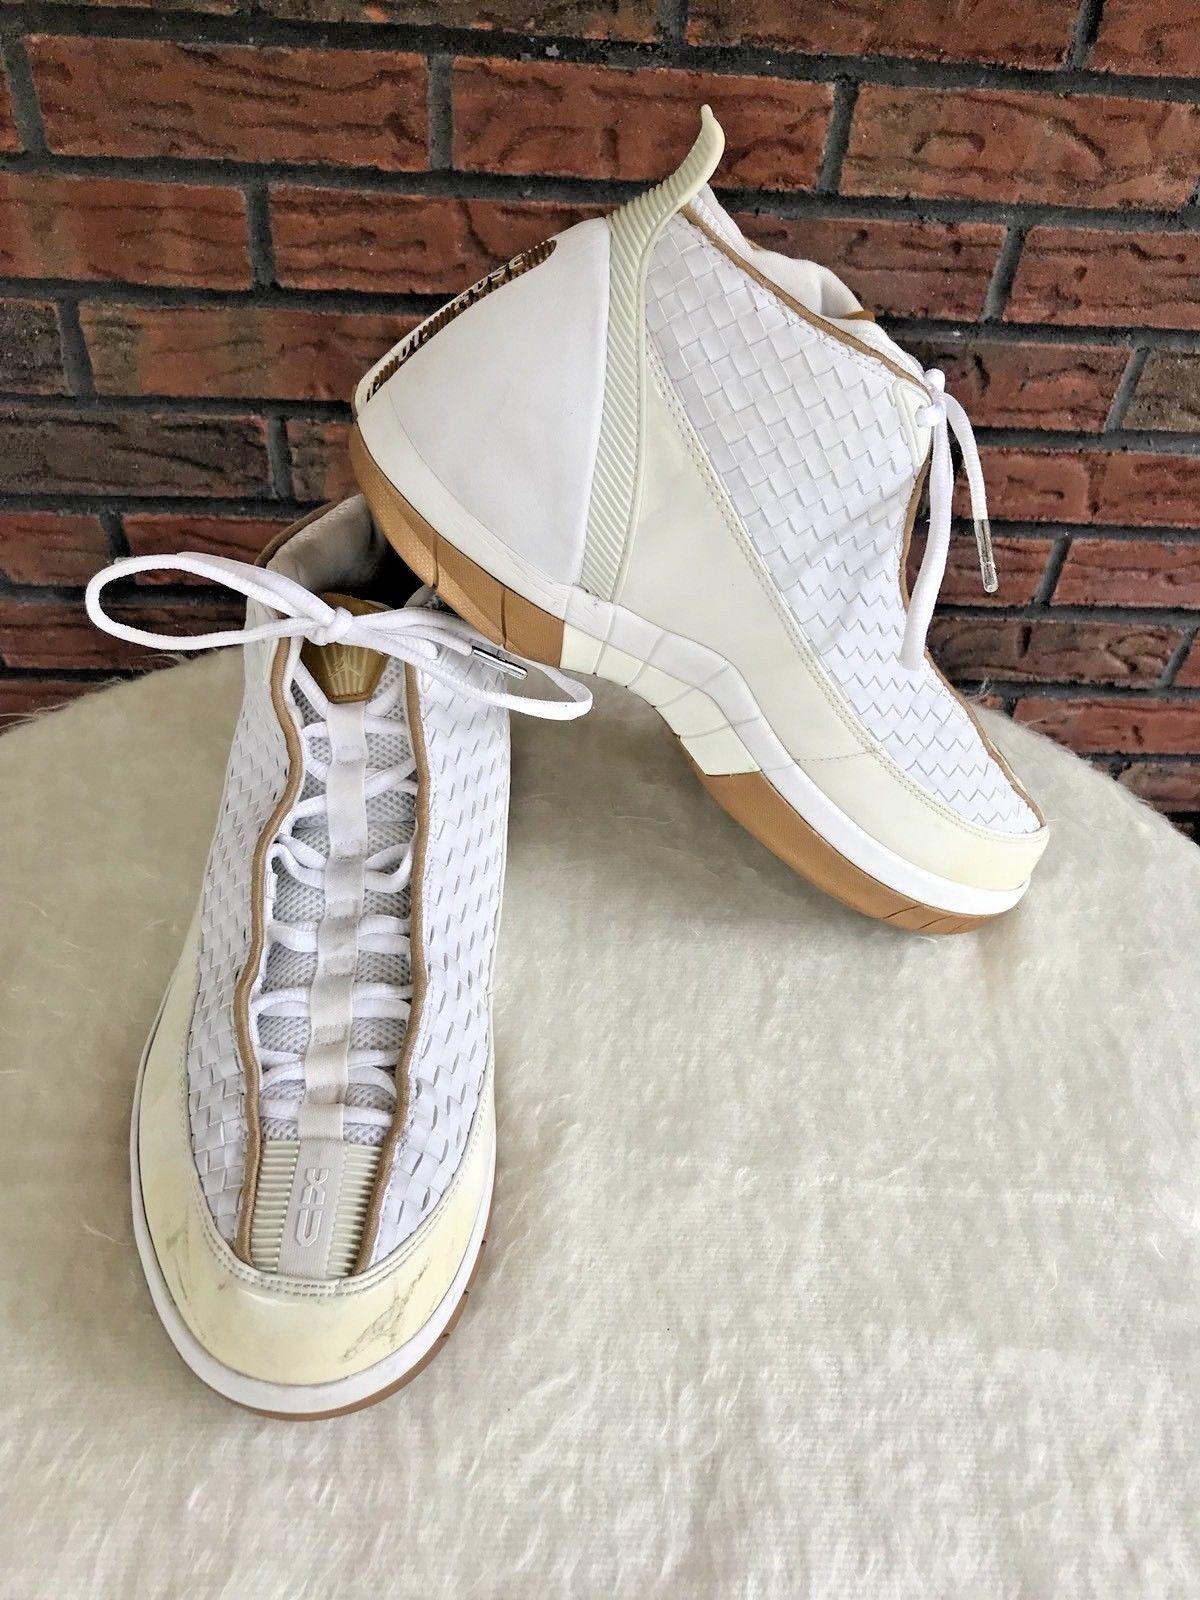 8c6904eb45b358 Nike Air Jordan XV SE Size 11.5 High Top and 50 similar items. 57